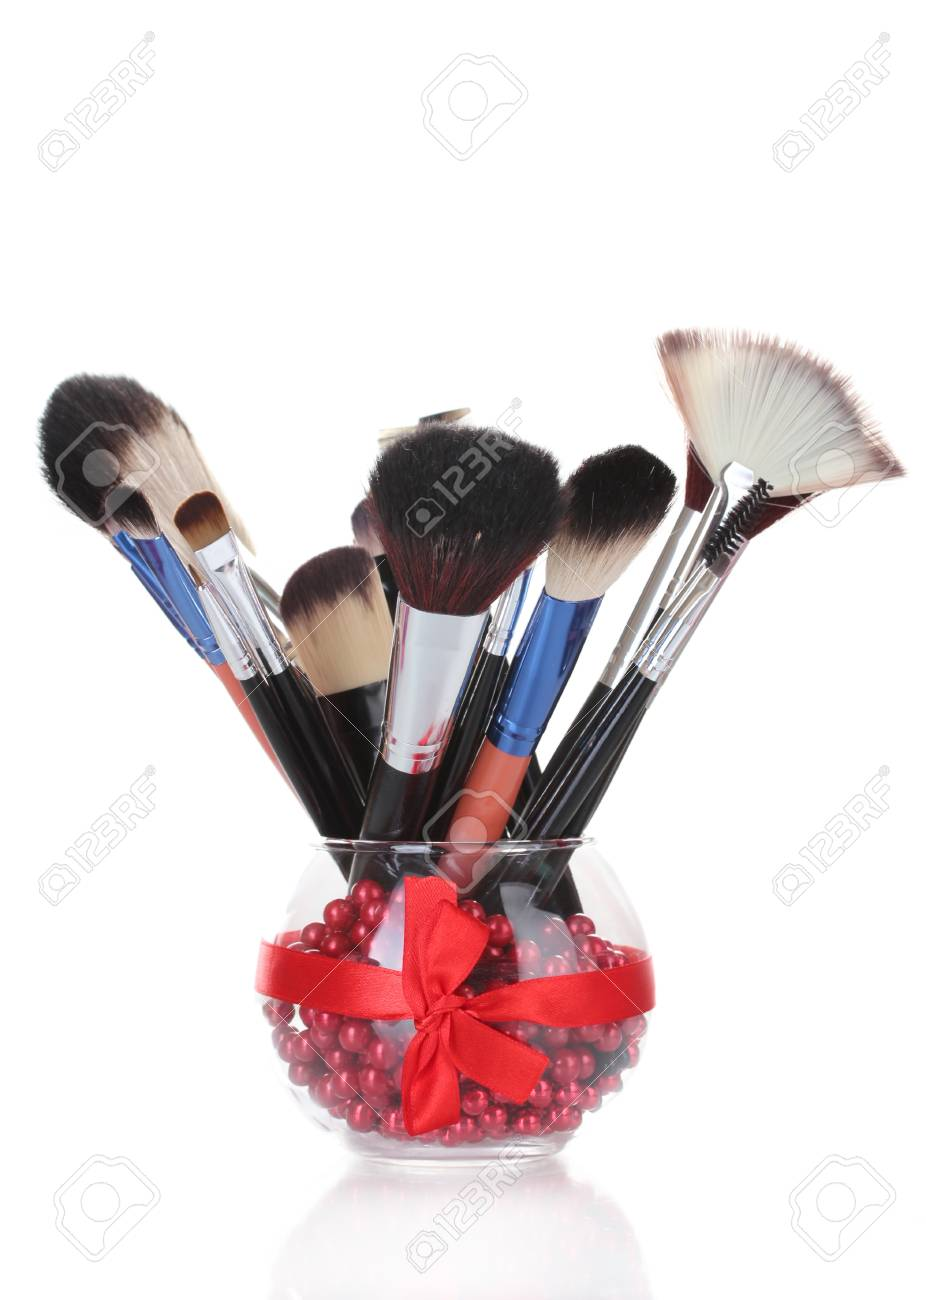 make-up brushes in glass vase isolated on white Stock Photo - 13234383